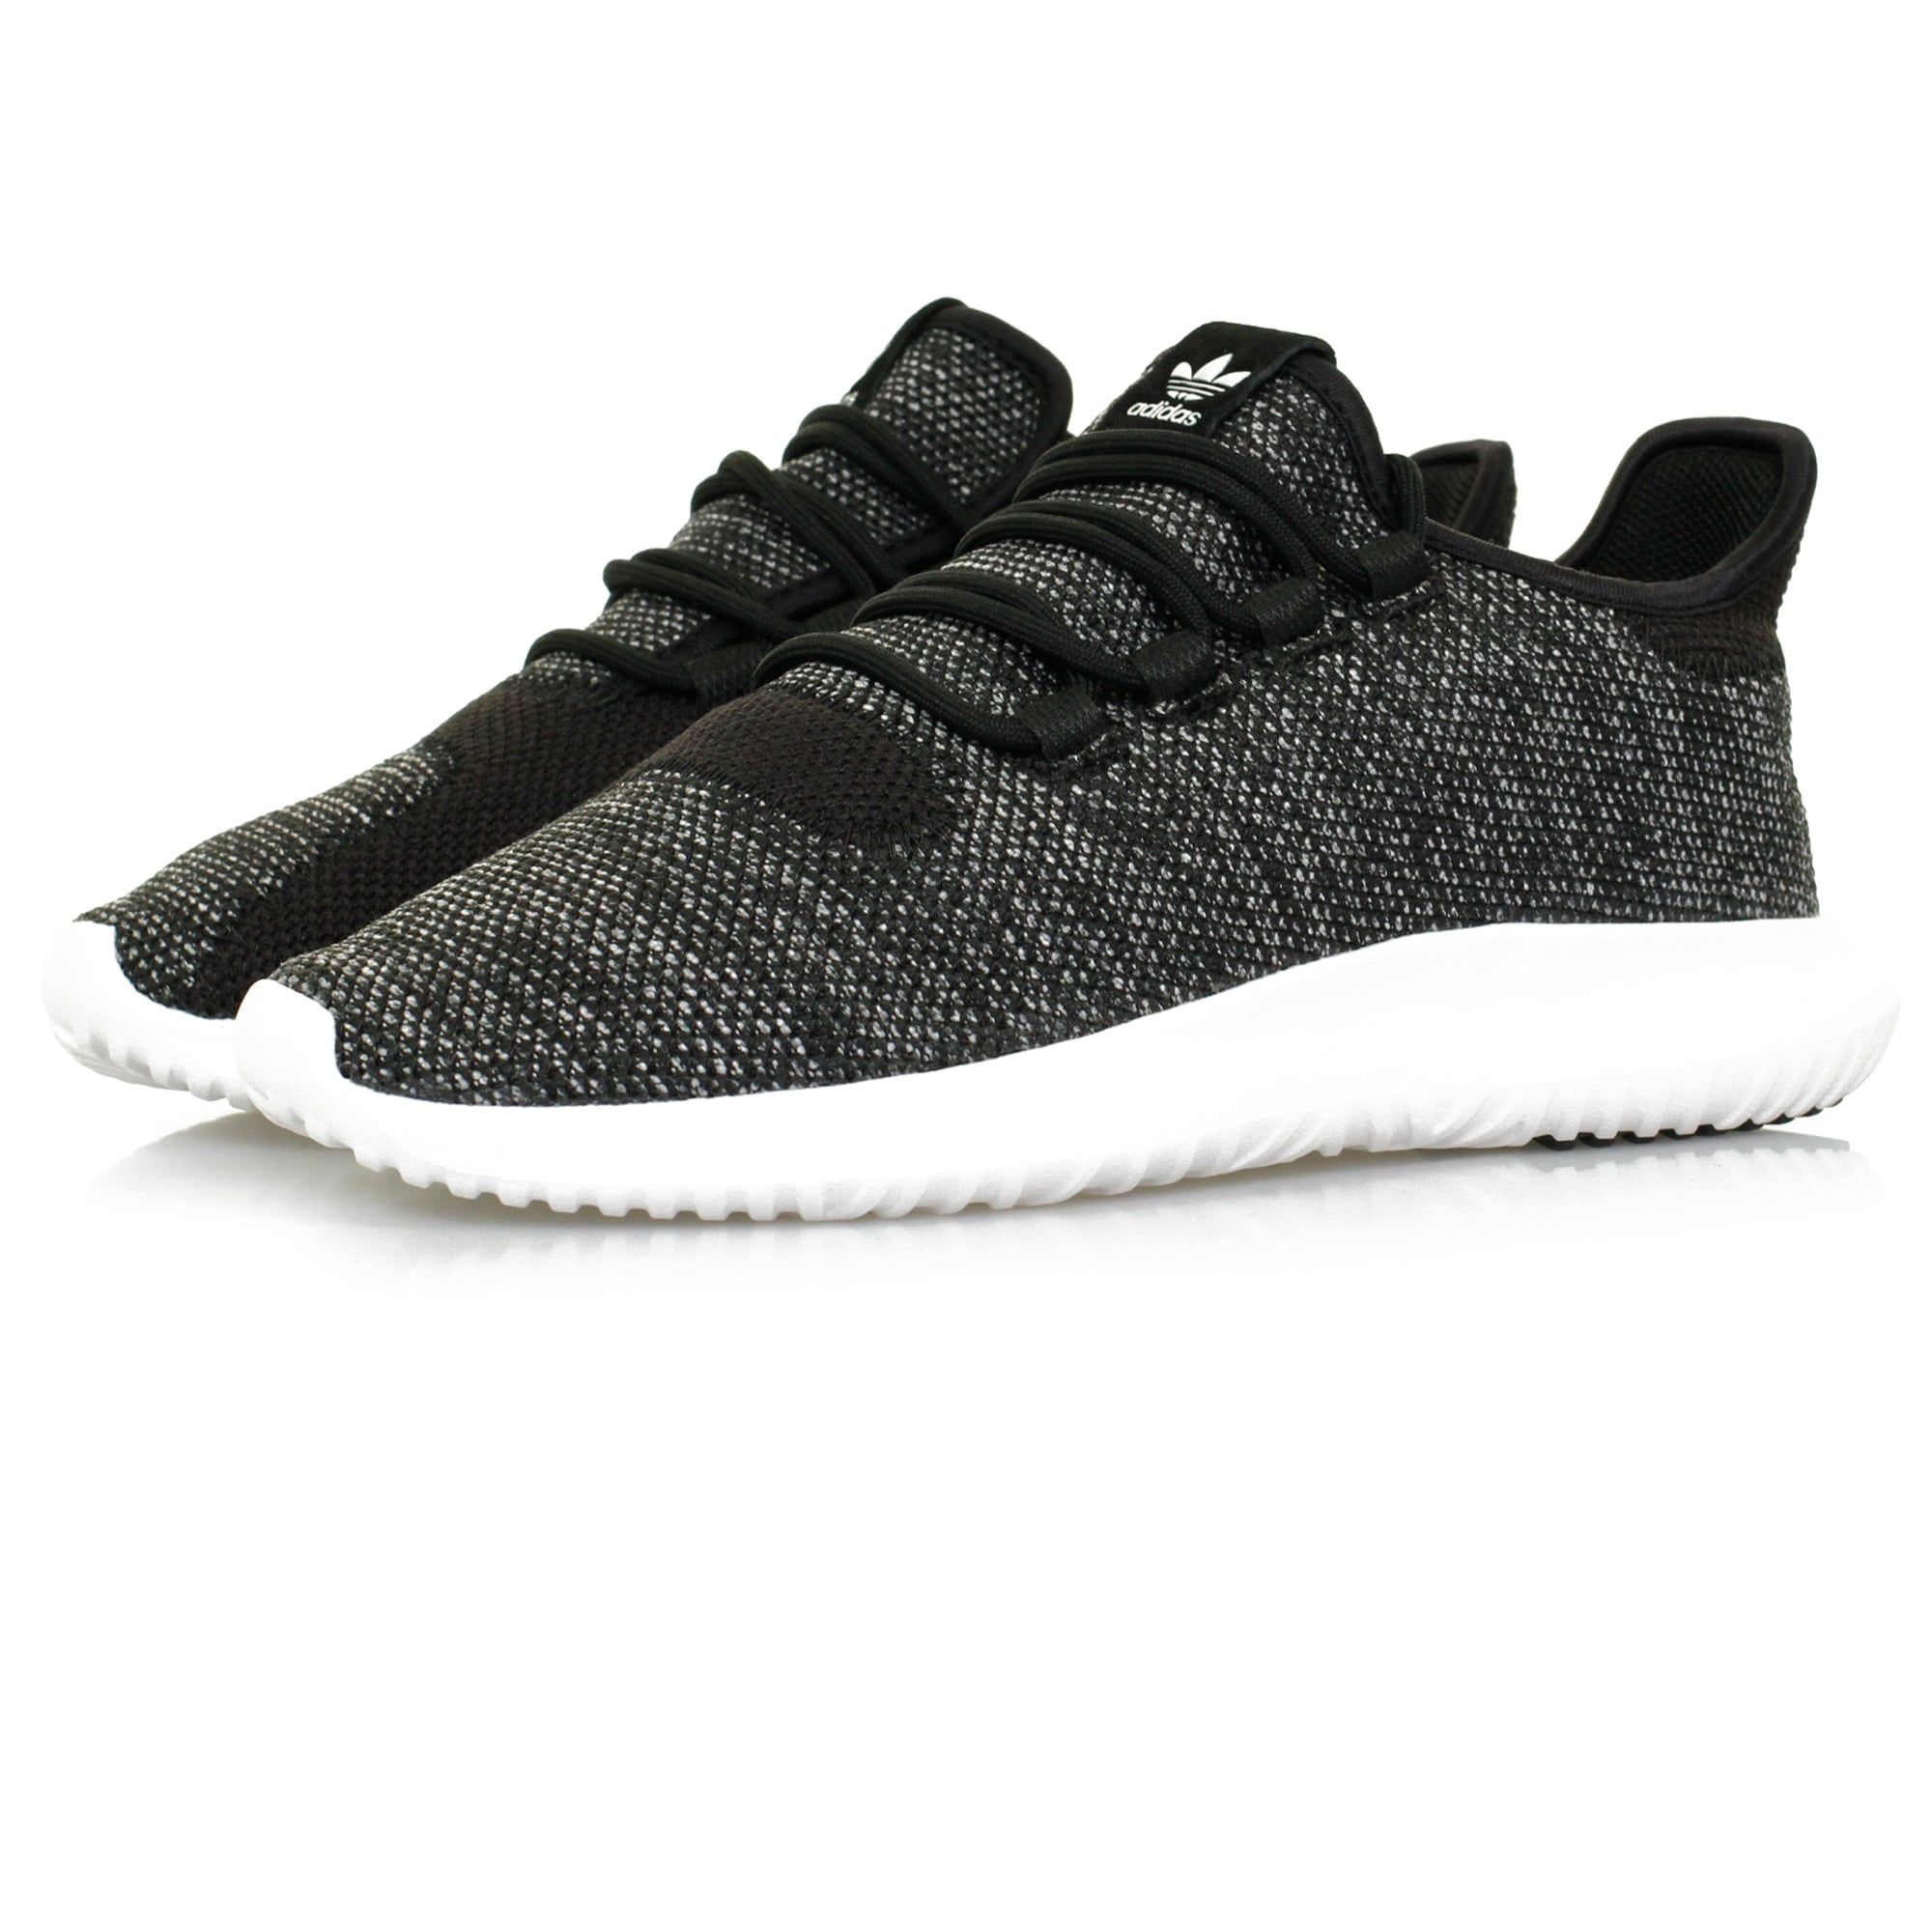 Adidas Rørformet Skygge Sko Svart uHmvjK